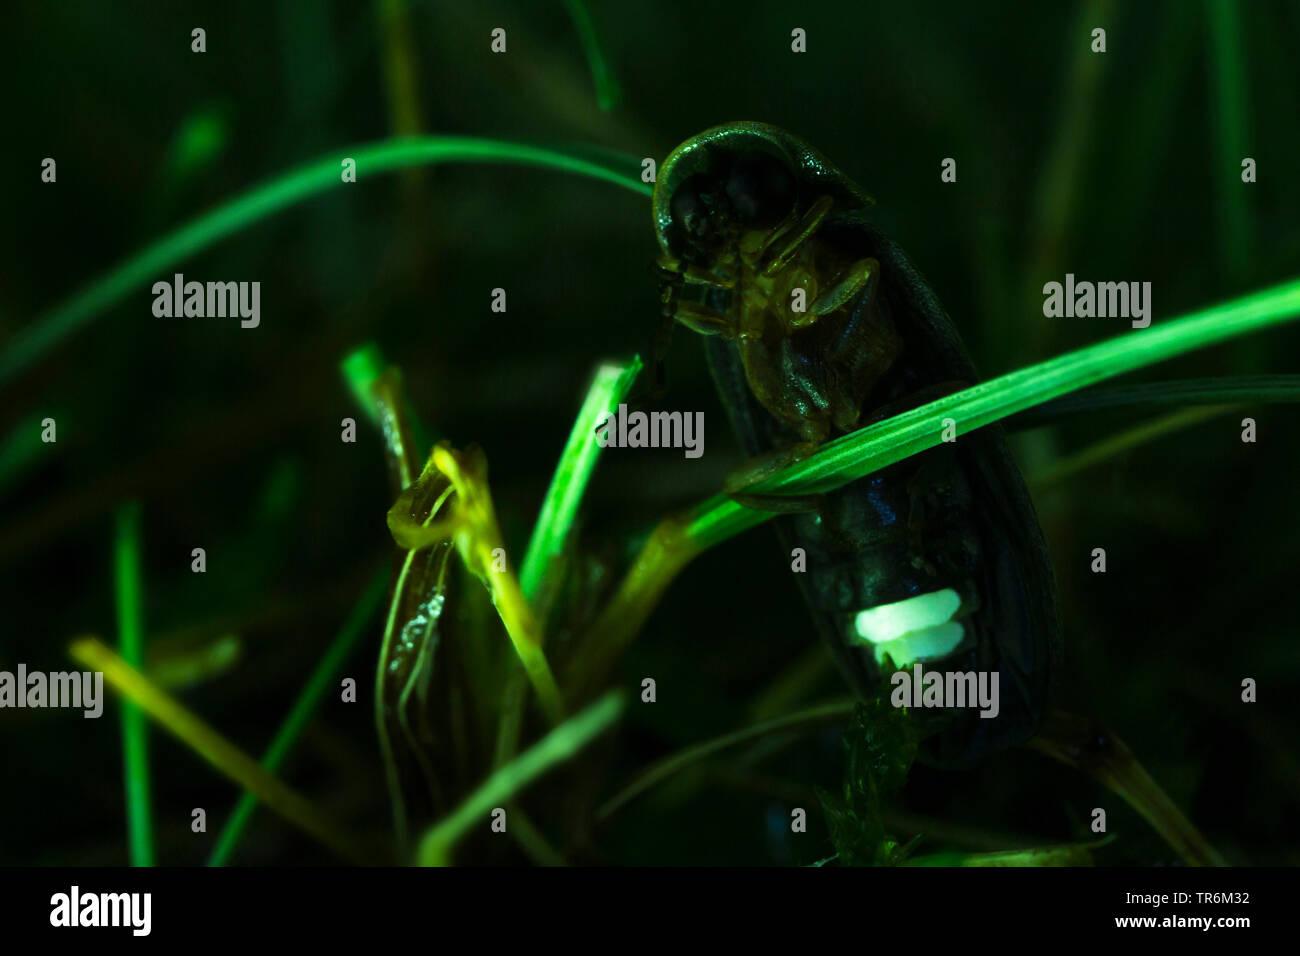 small lightning beetle (Lamprohiza splendidula, Phausis splendidula), sitting at a spear and lighting in the night, Germany, Bavaria, Niederbayern, Lower Bavaria Stock Photo